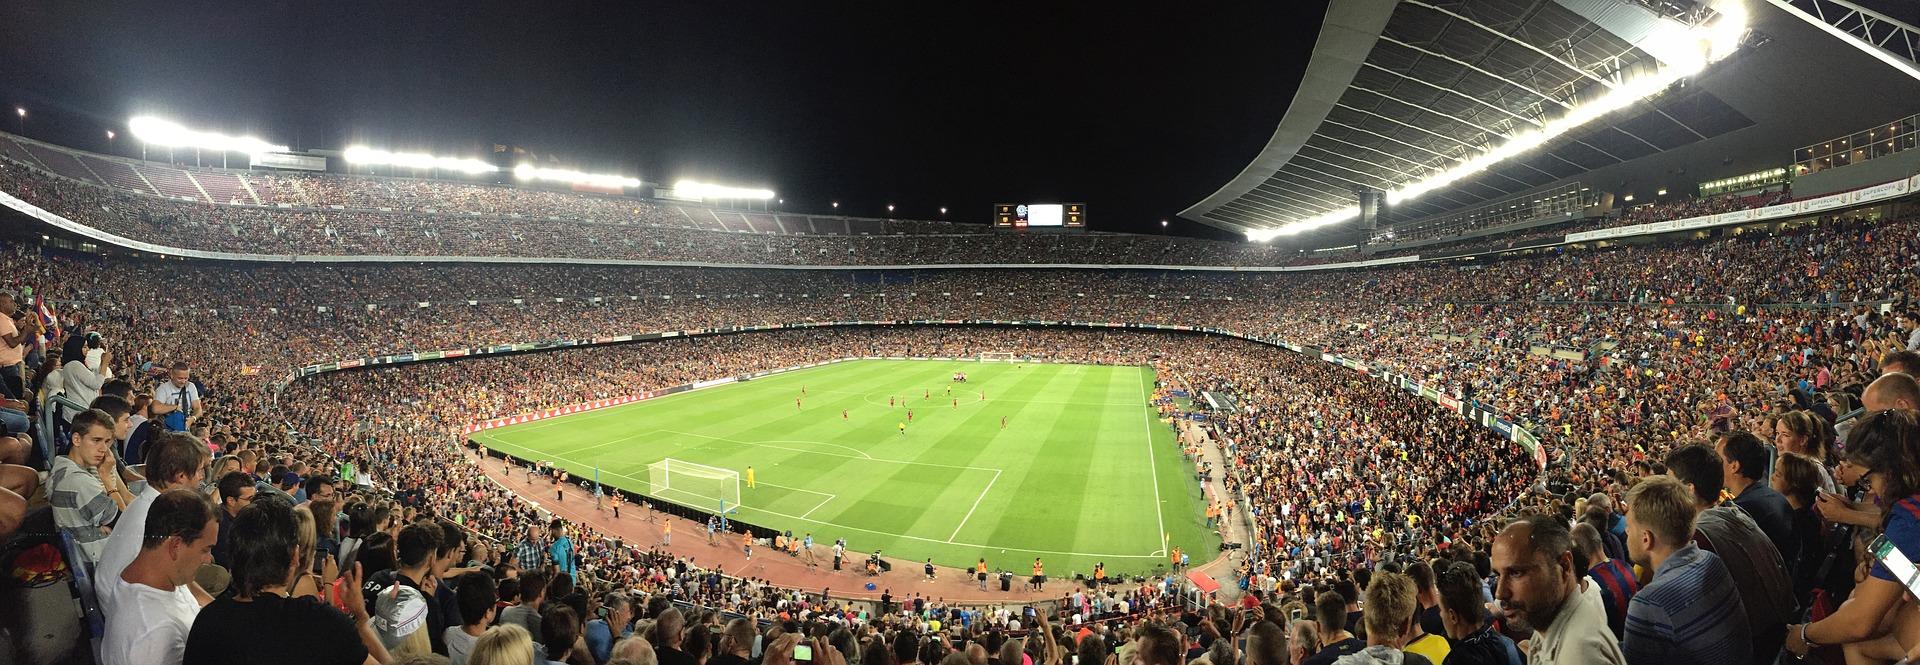 Camp Nou de noche